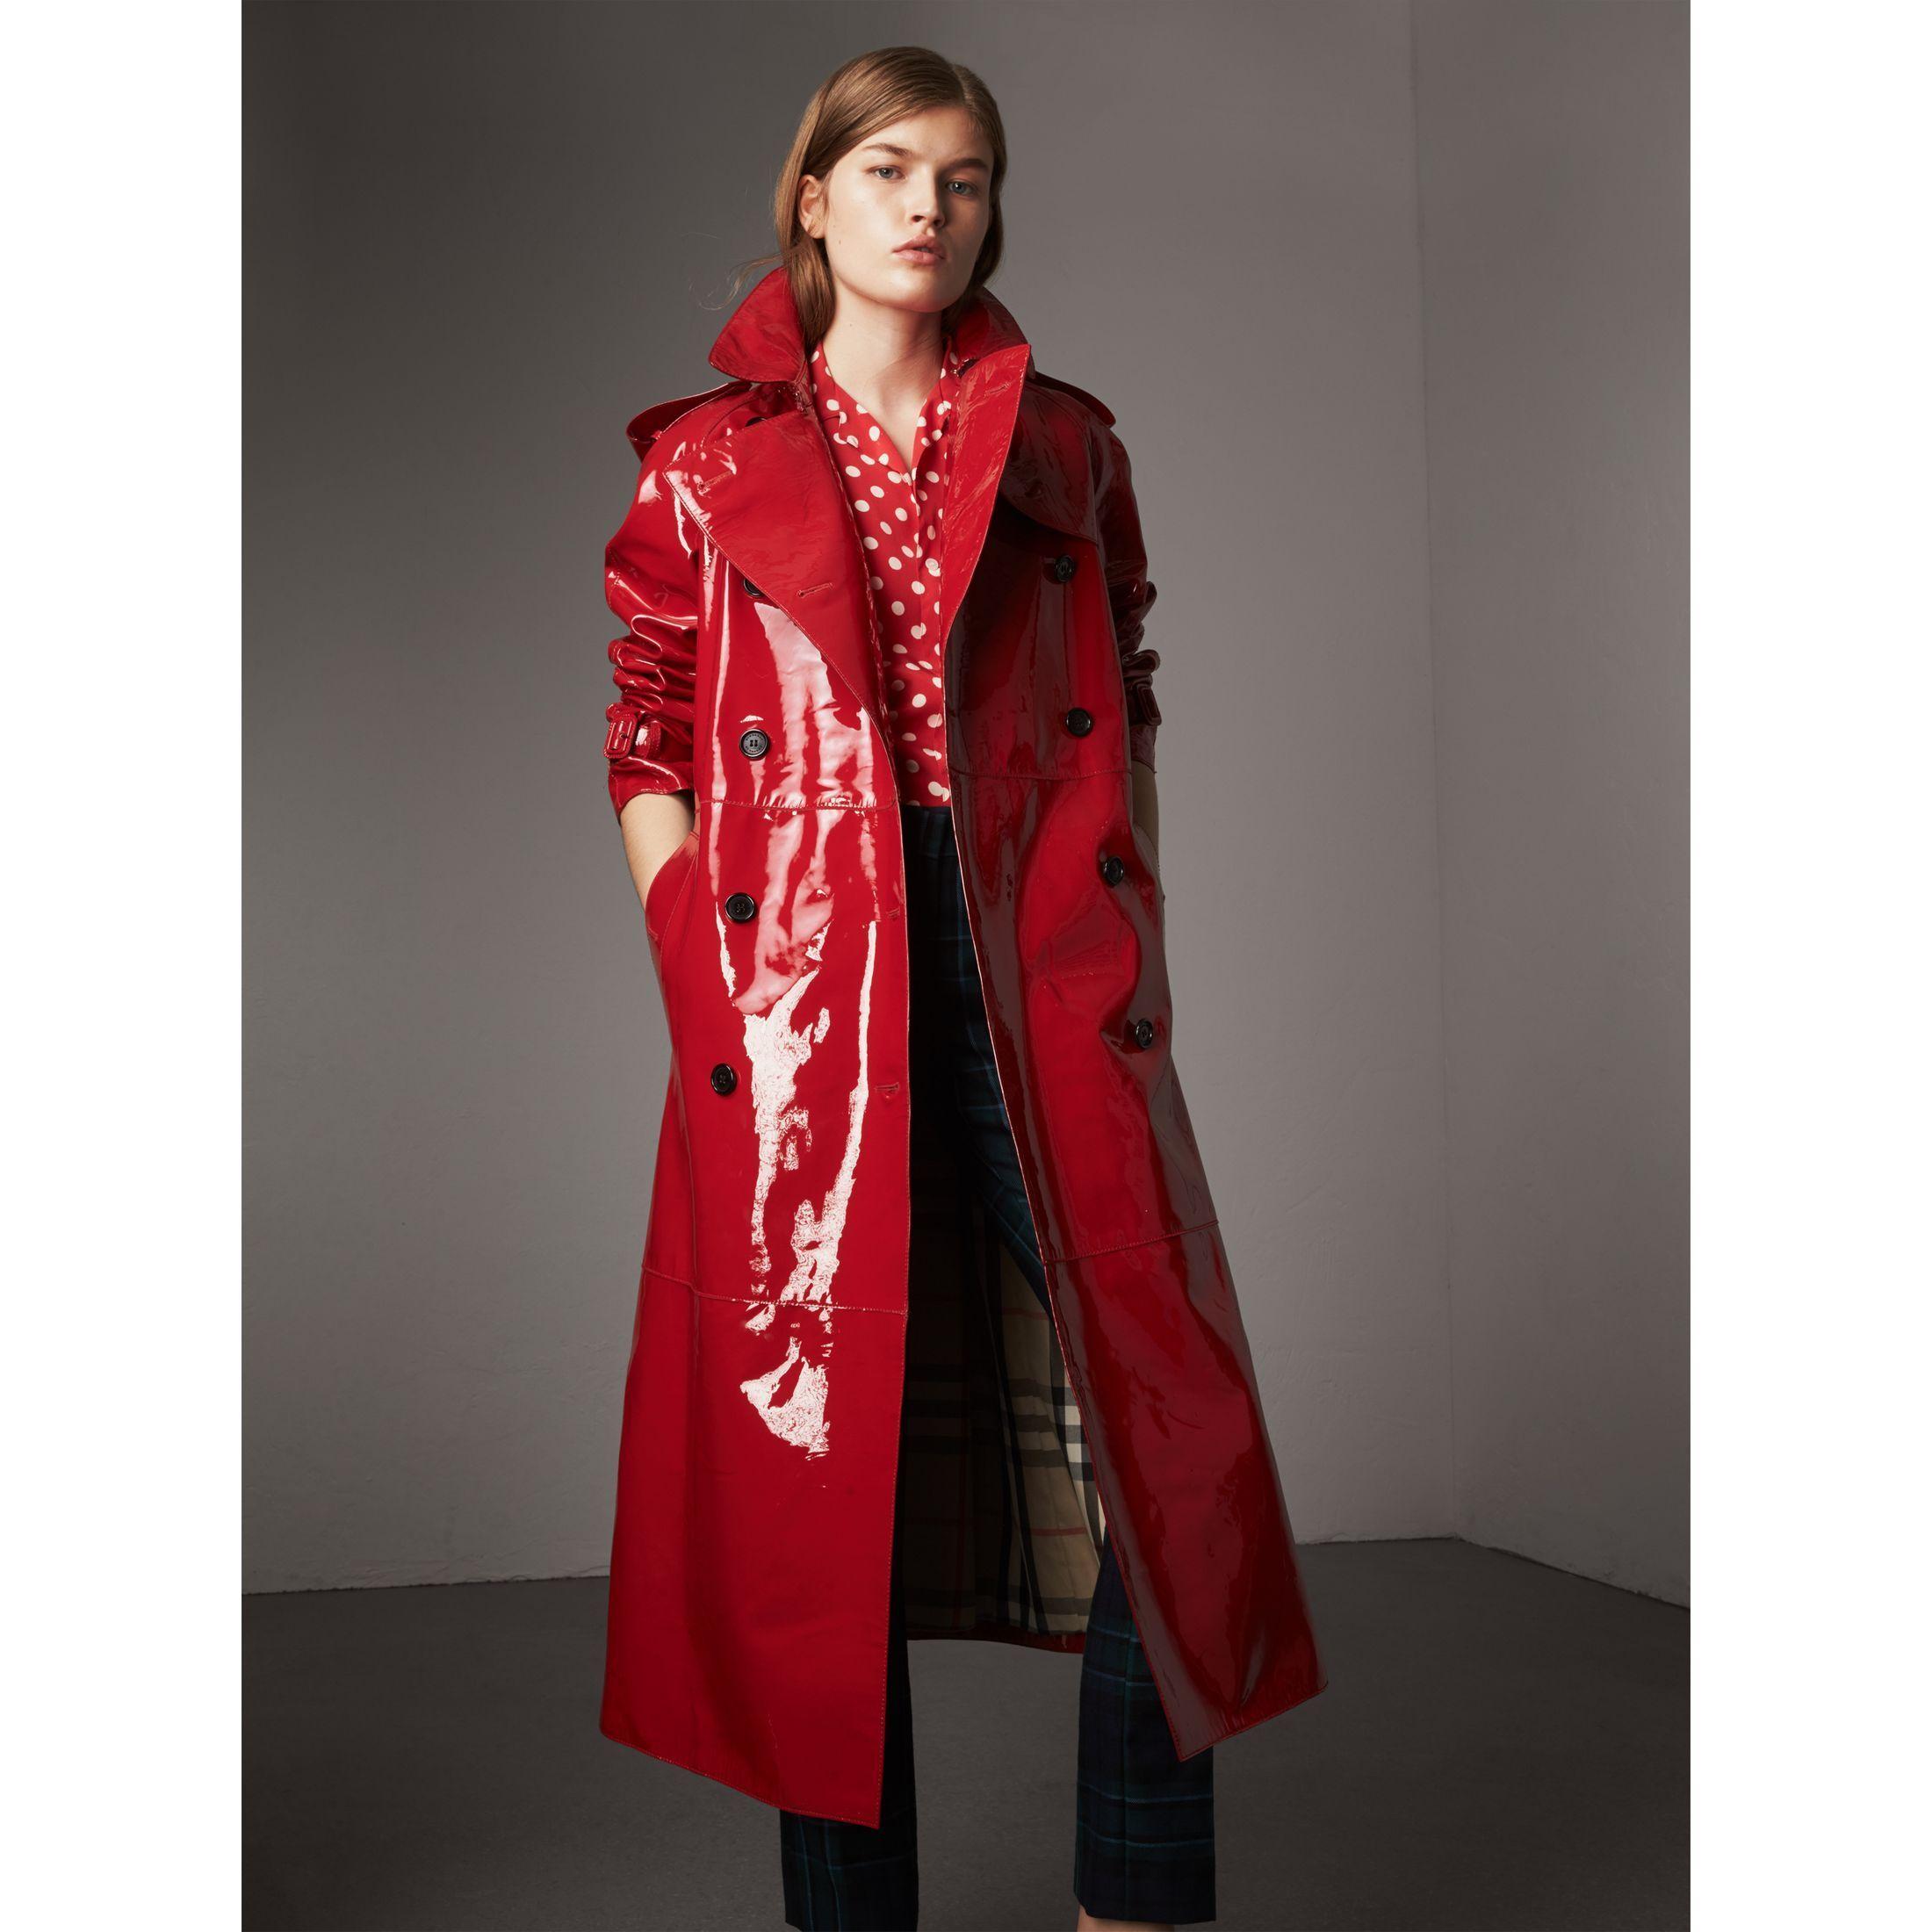 Trench Coats for Women   Burberry®   Pinterest   Regenmantel, Pvc ... aae90f695a